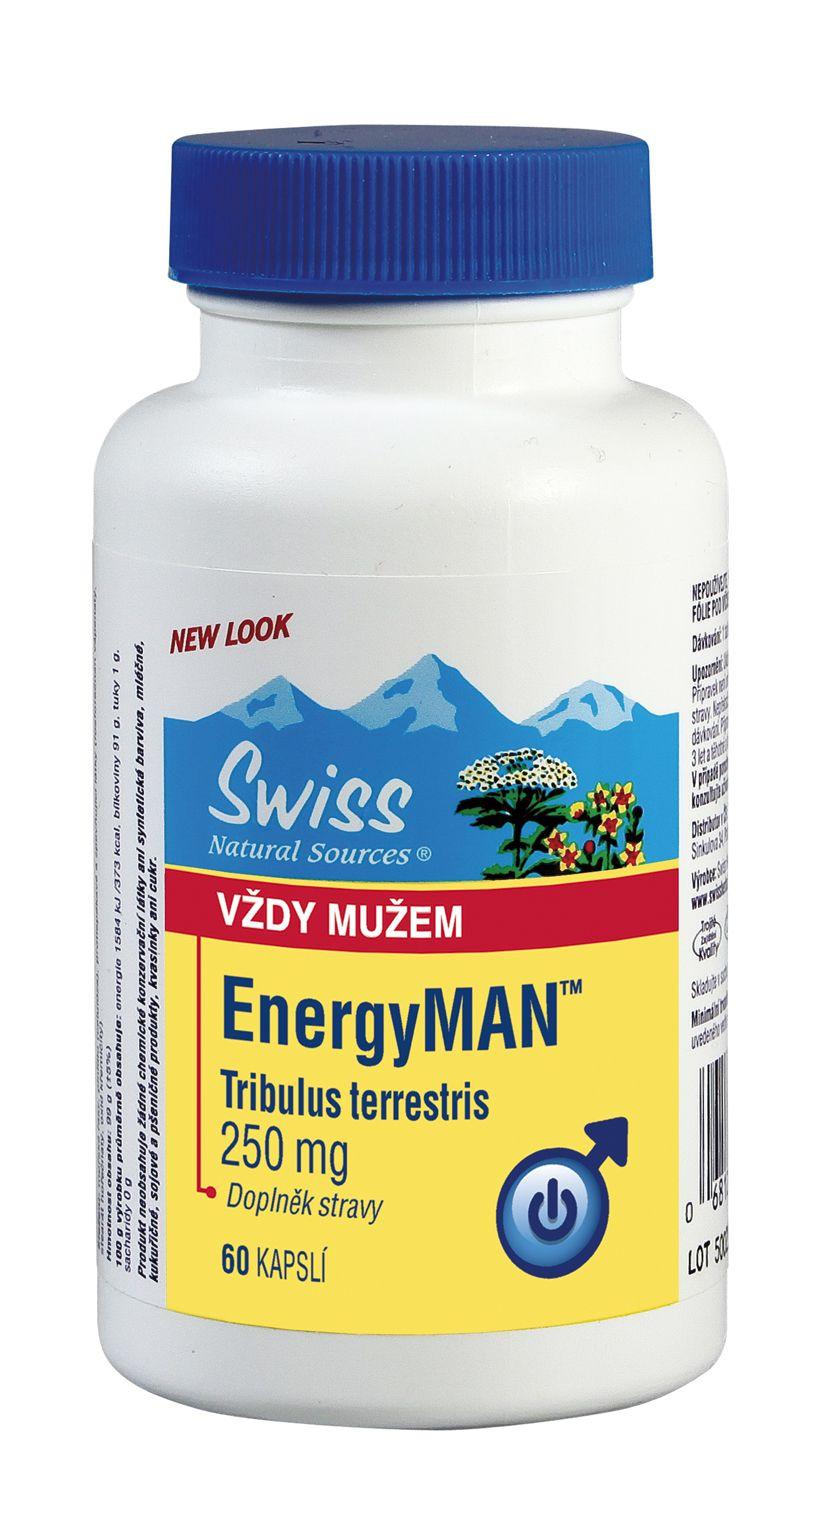 Swiss EnergyMAN libido 60 kapslí